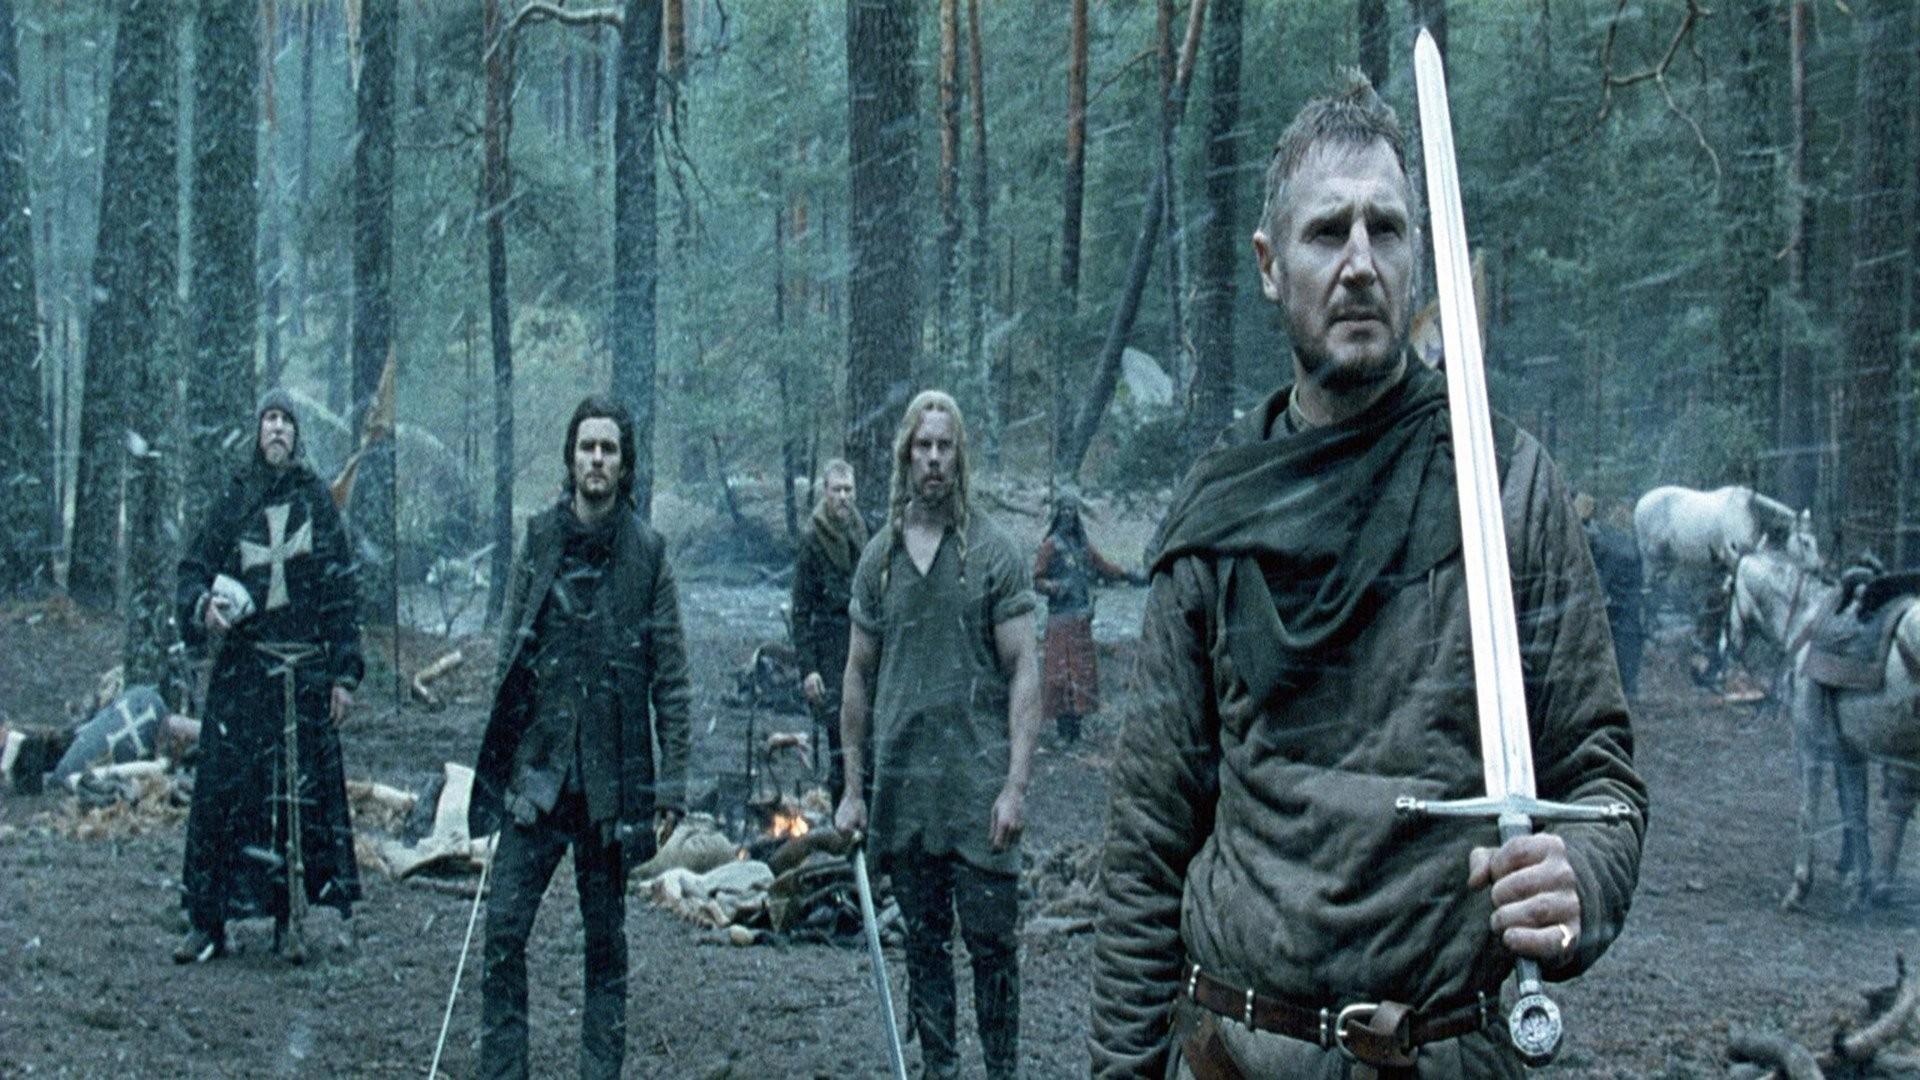 VIKINGS action drama history fantasy adventure series 1vikings viking  warrior wallpaper     578998   WallpaperUP